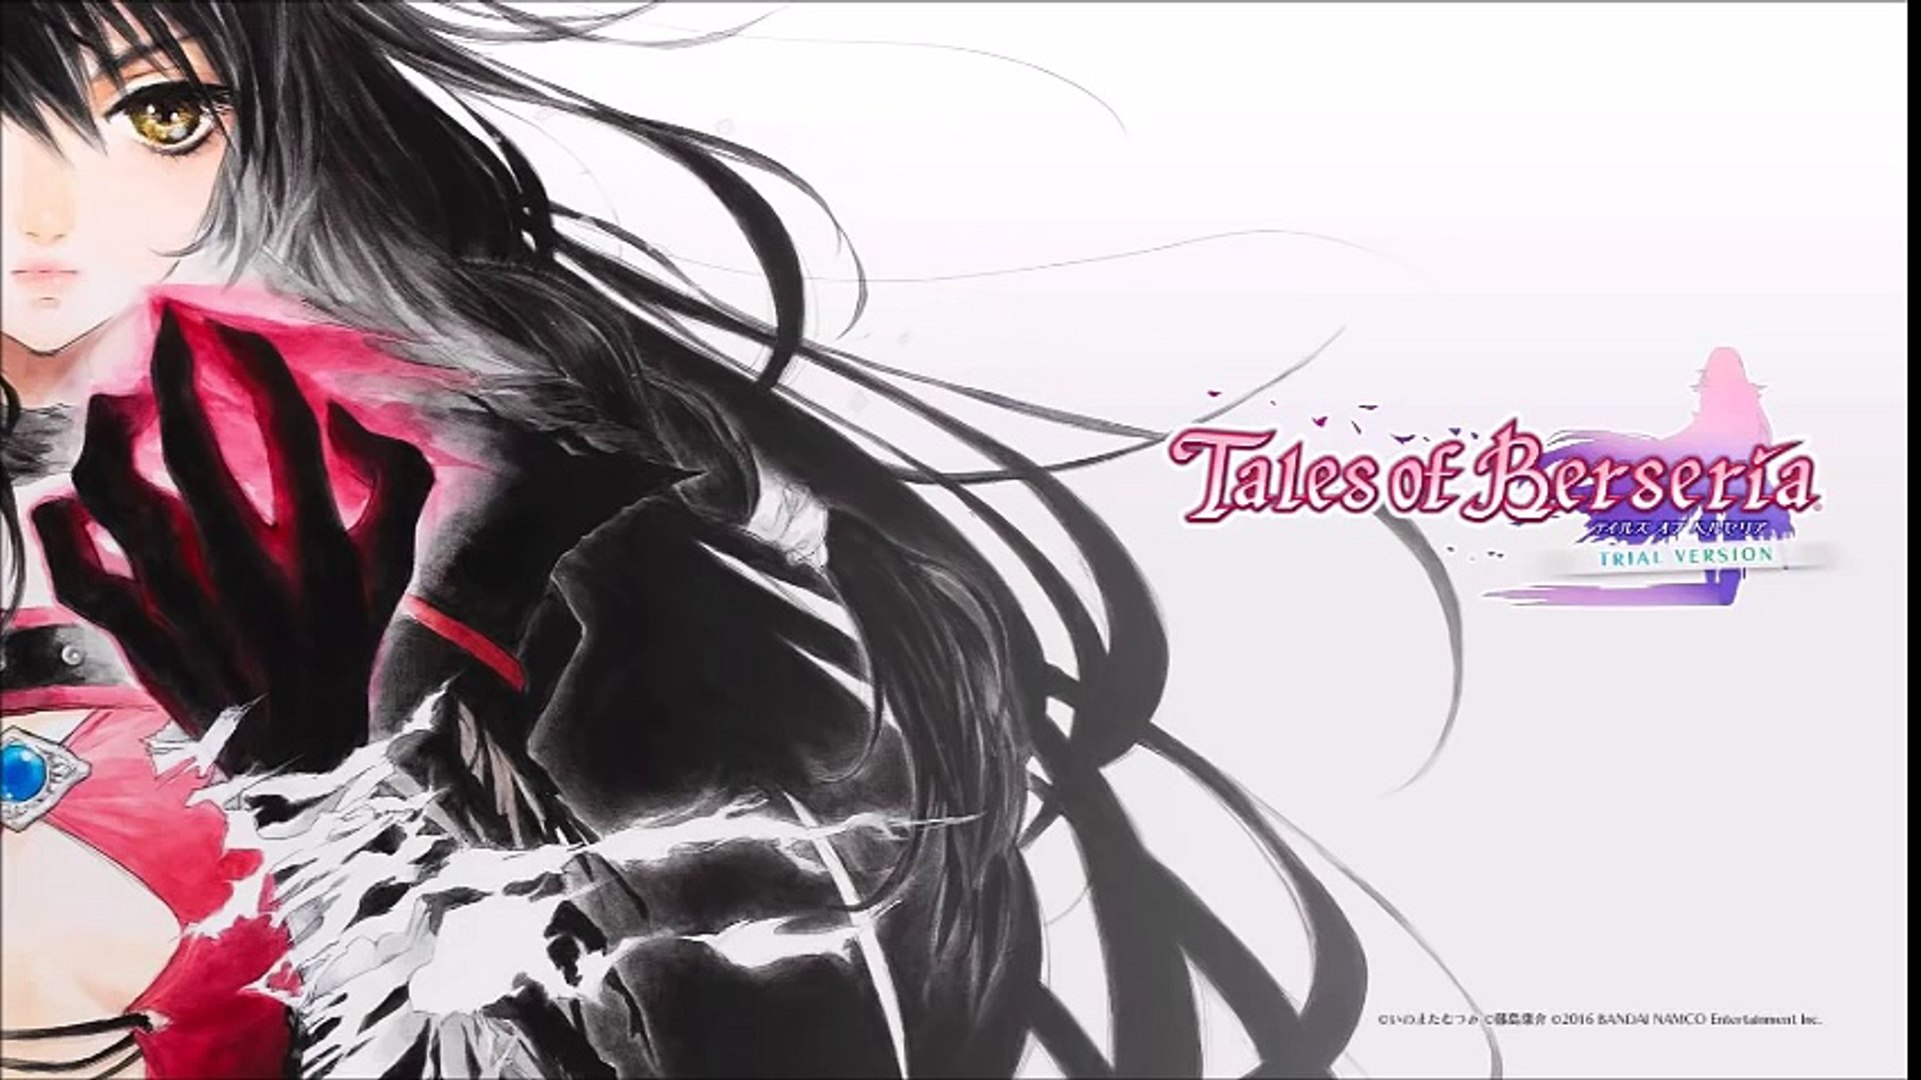 Tales of Berseria - Boss Theme [In-Game]